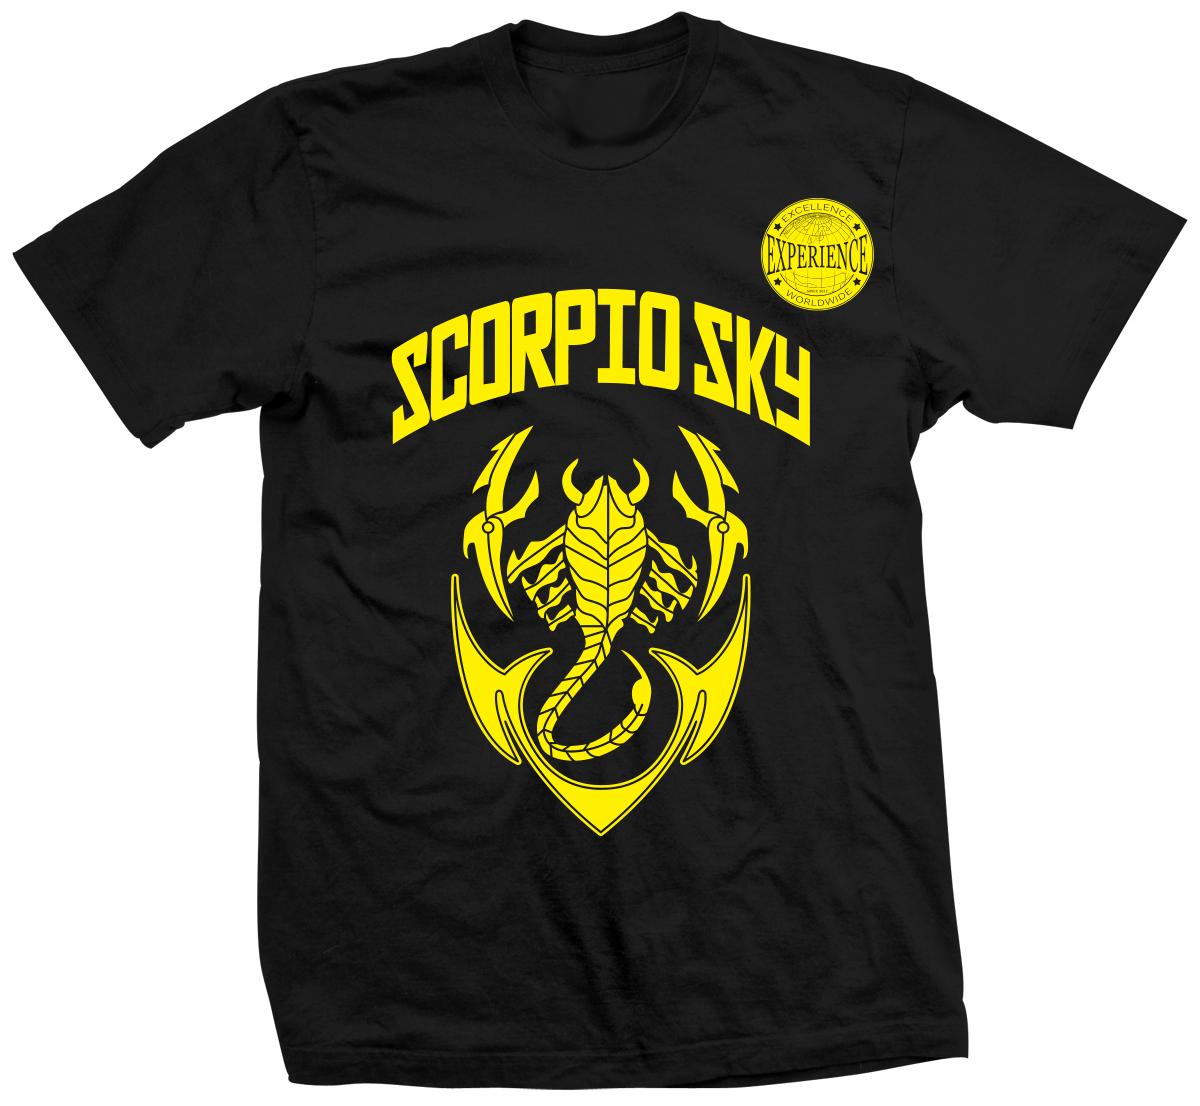 scorpioblackmock.jpg 558da2748